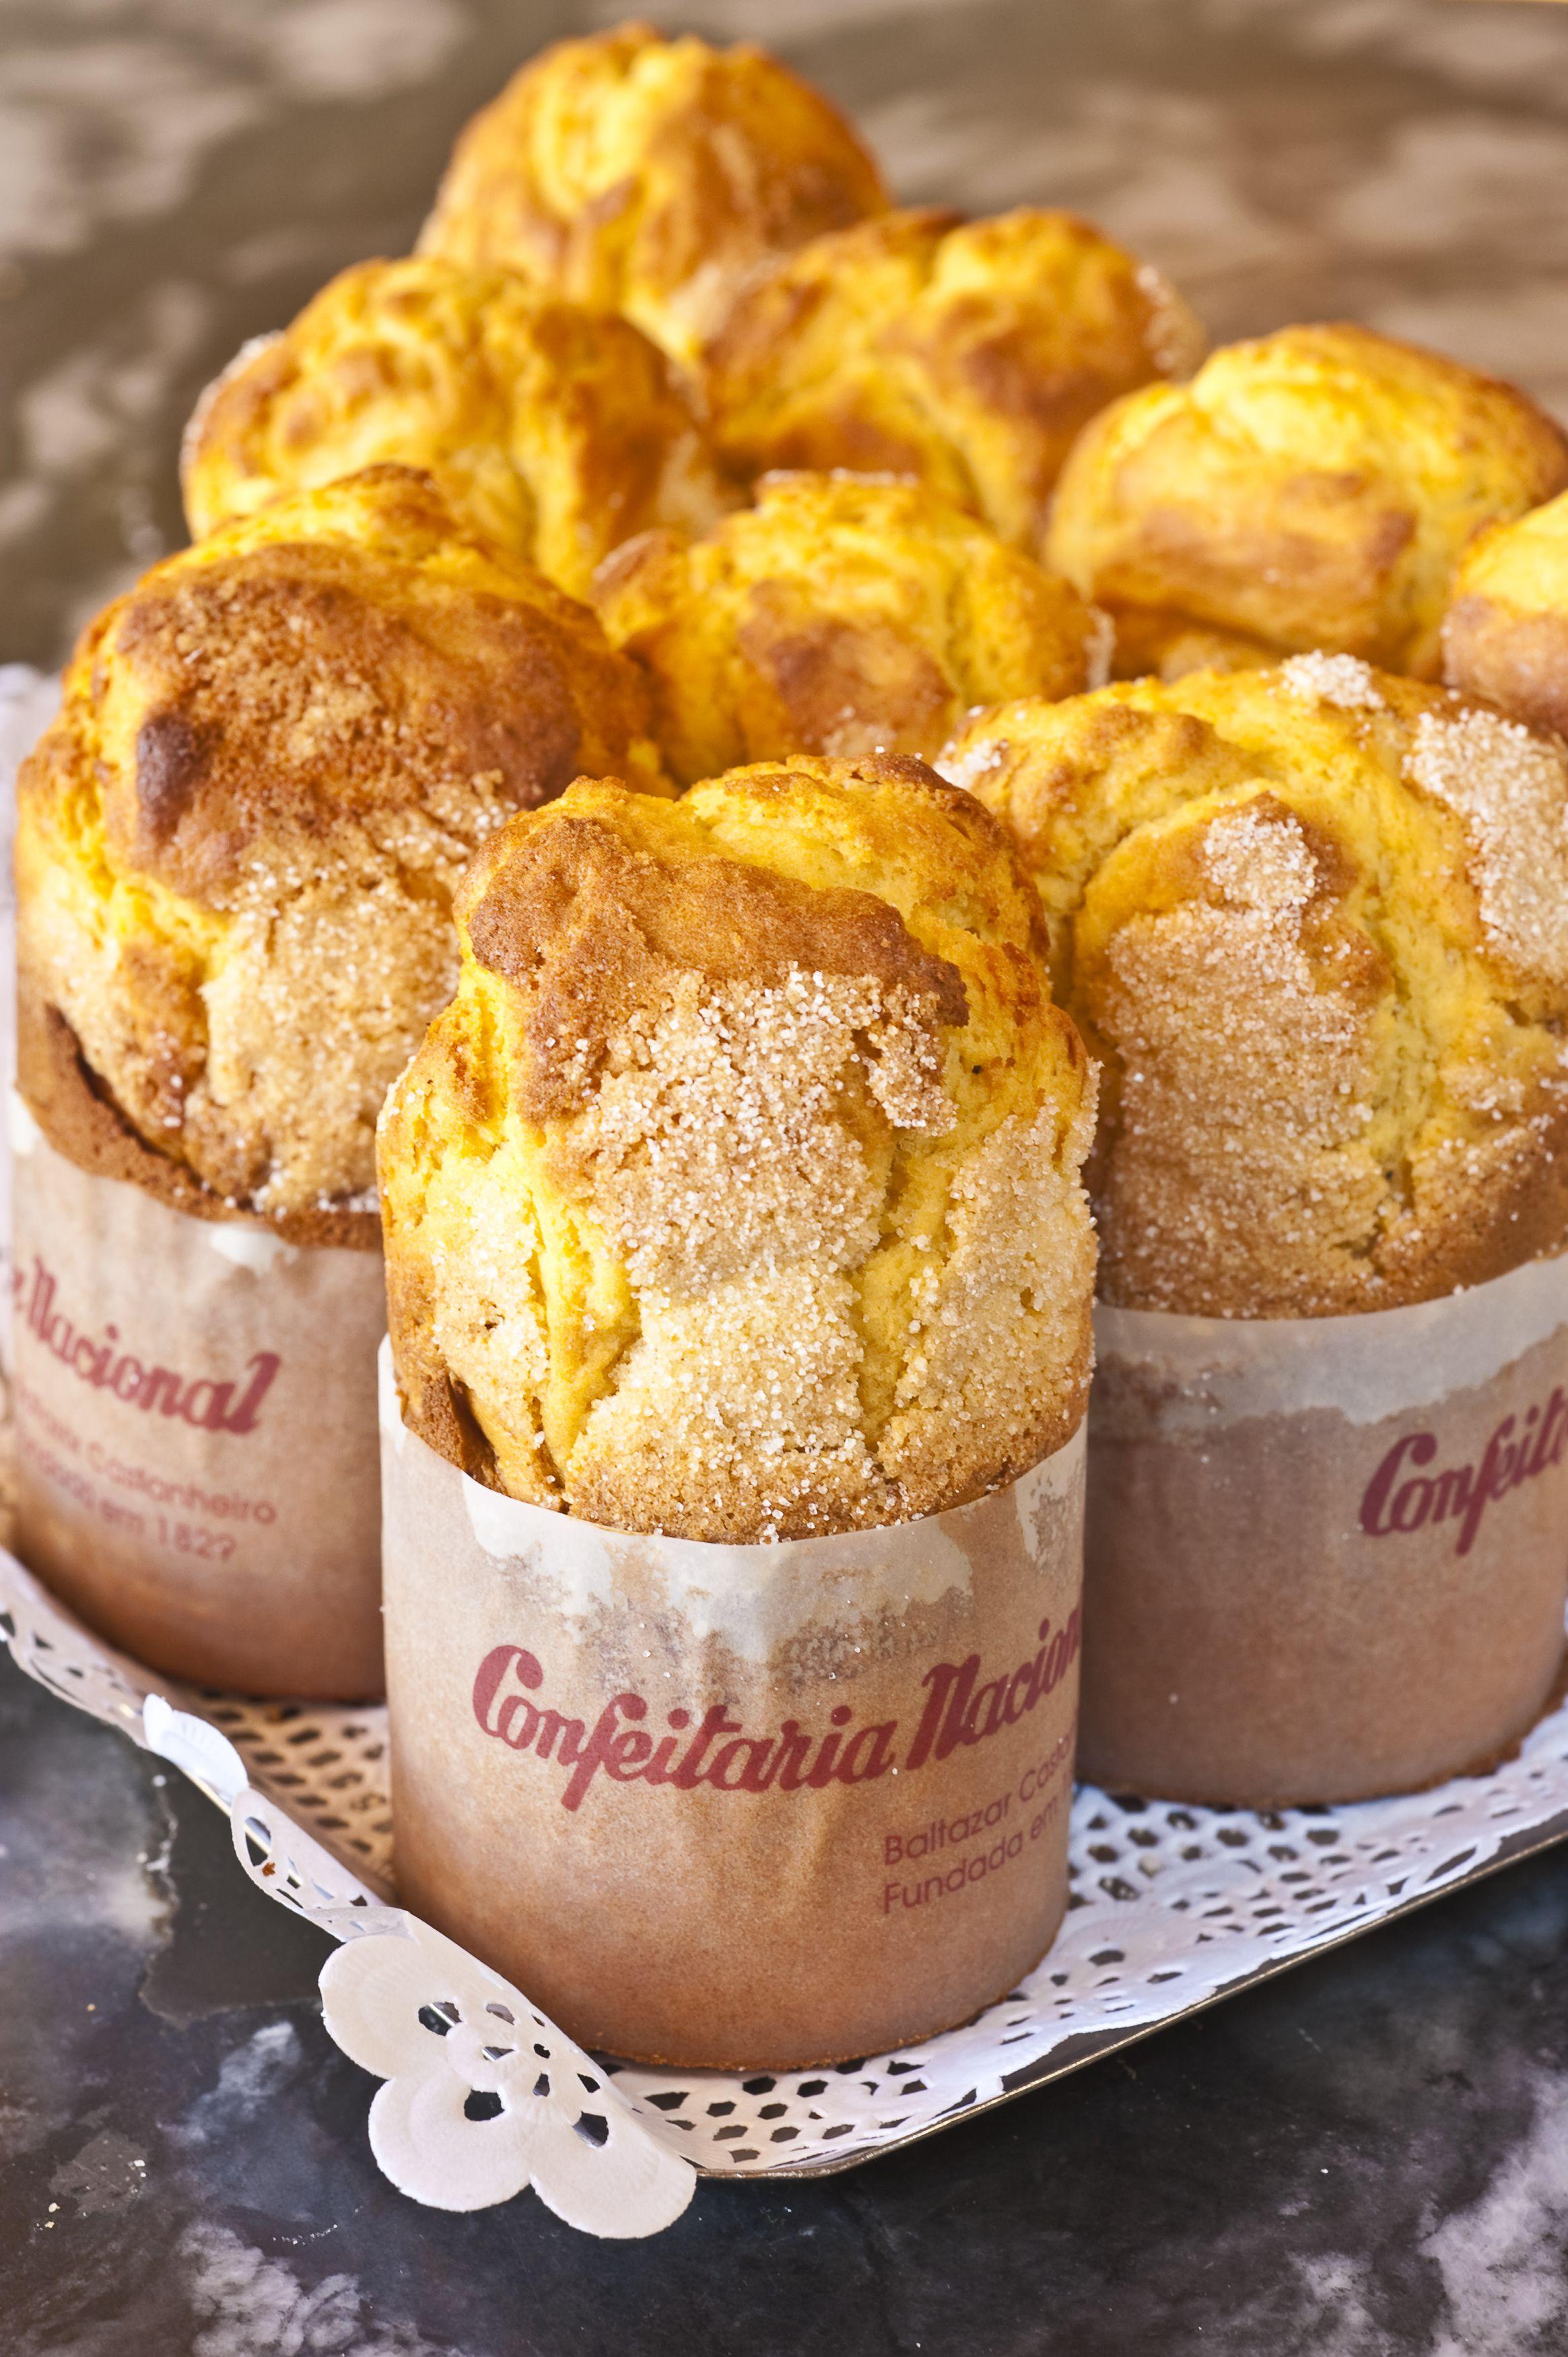 Portuguese dessert Bolo de Arroz. @allegra7382